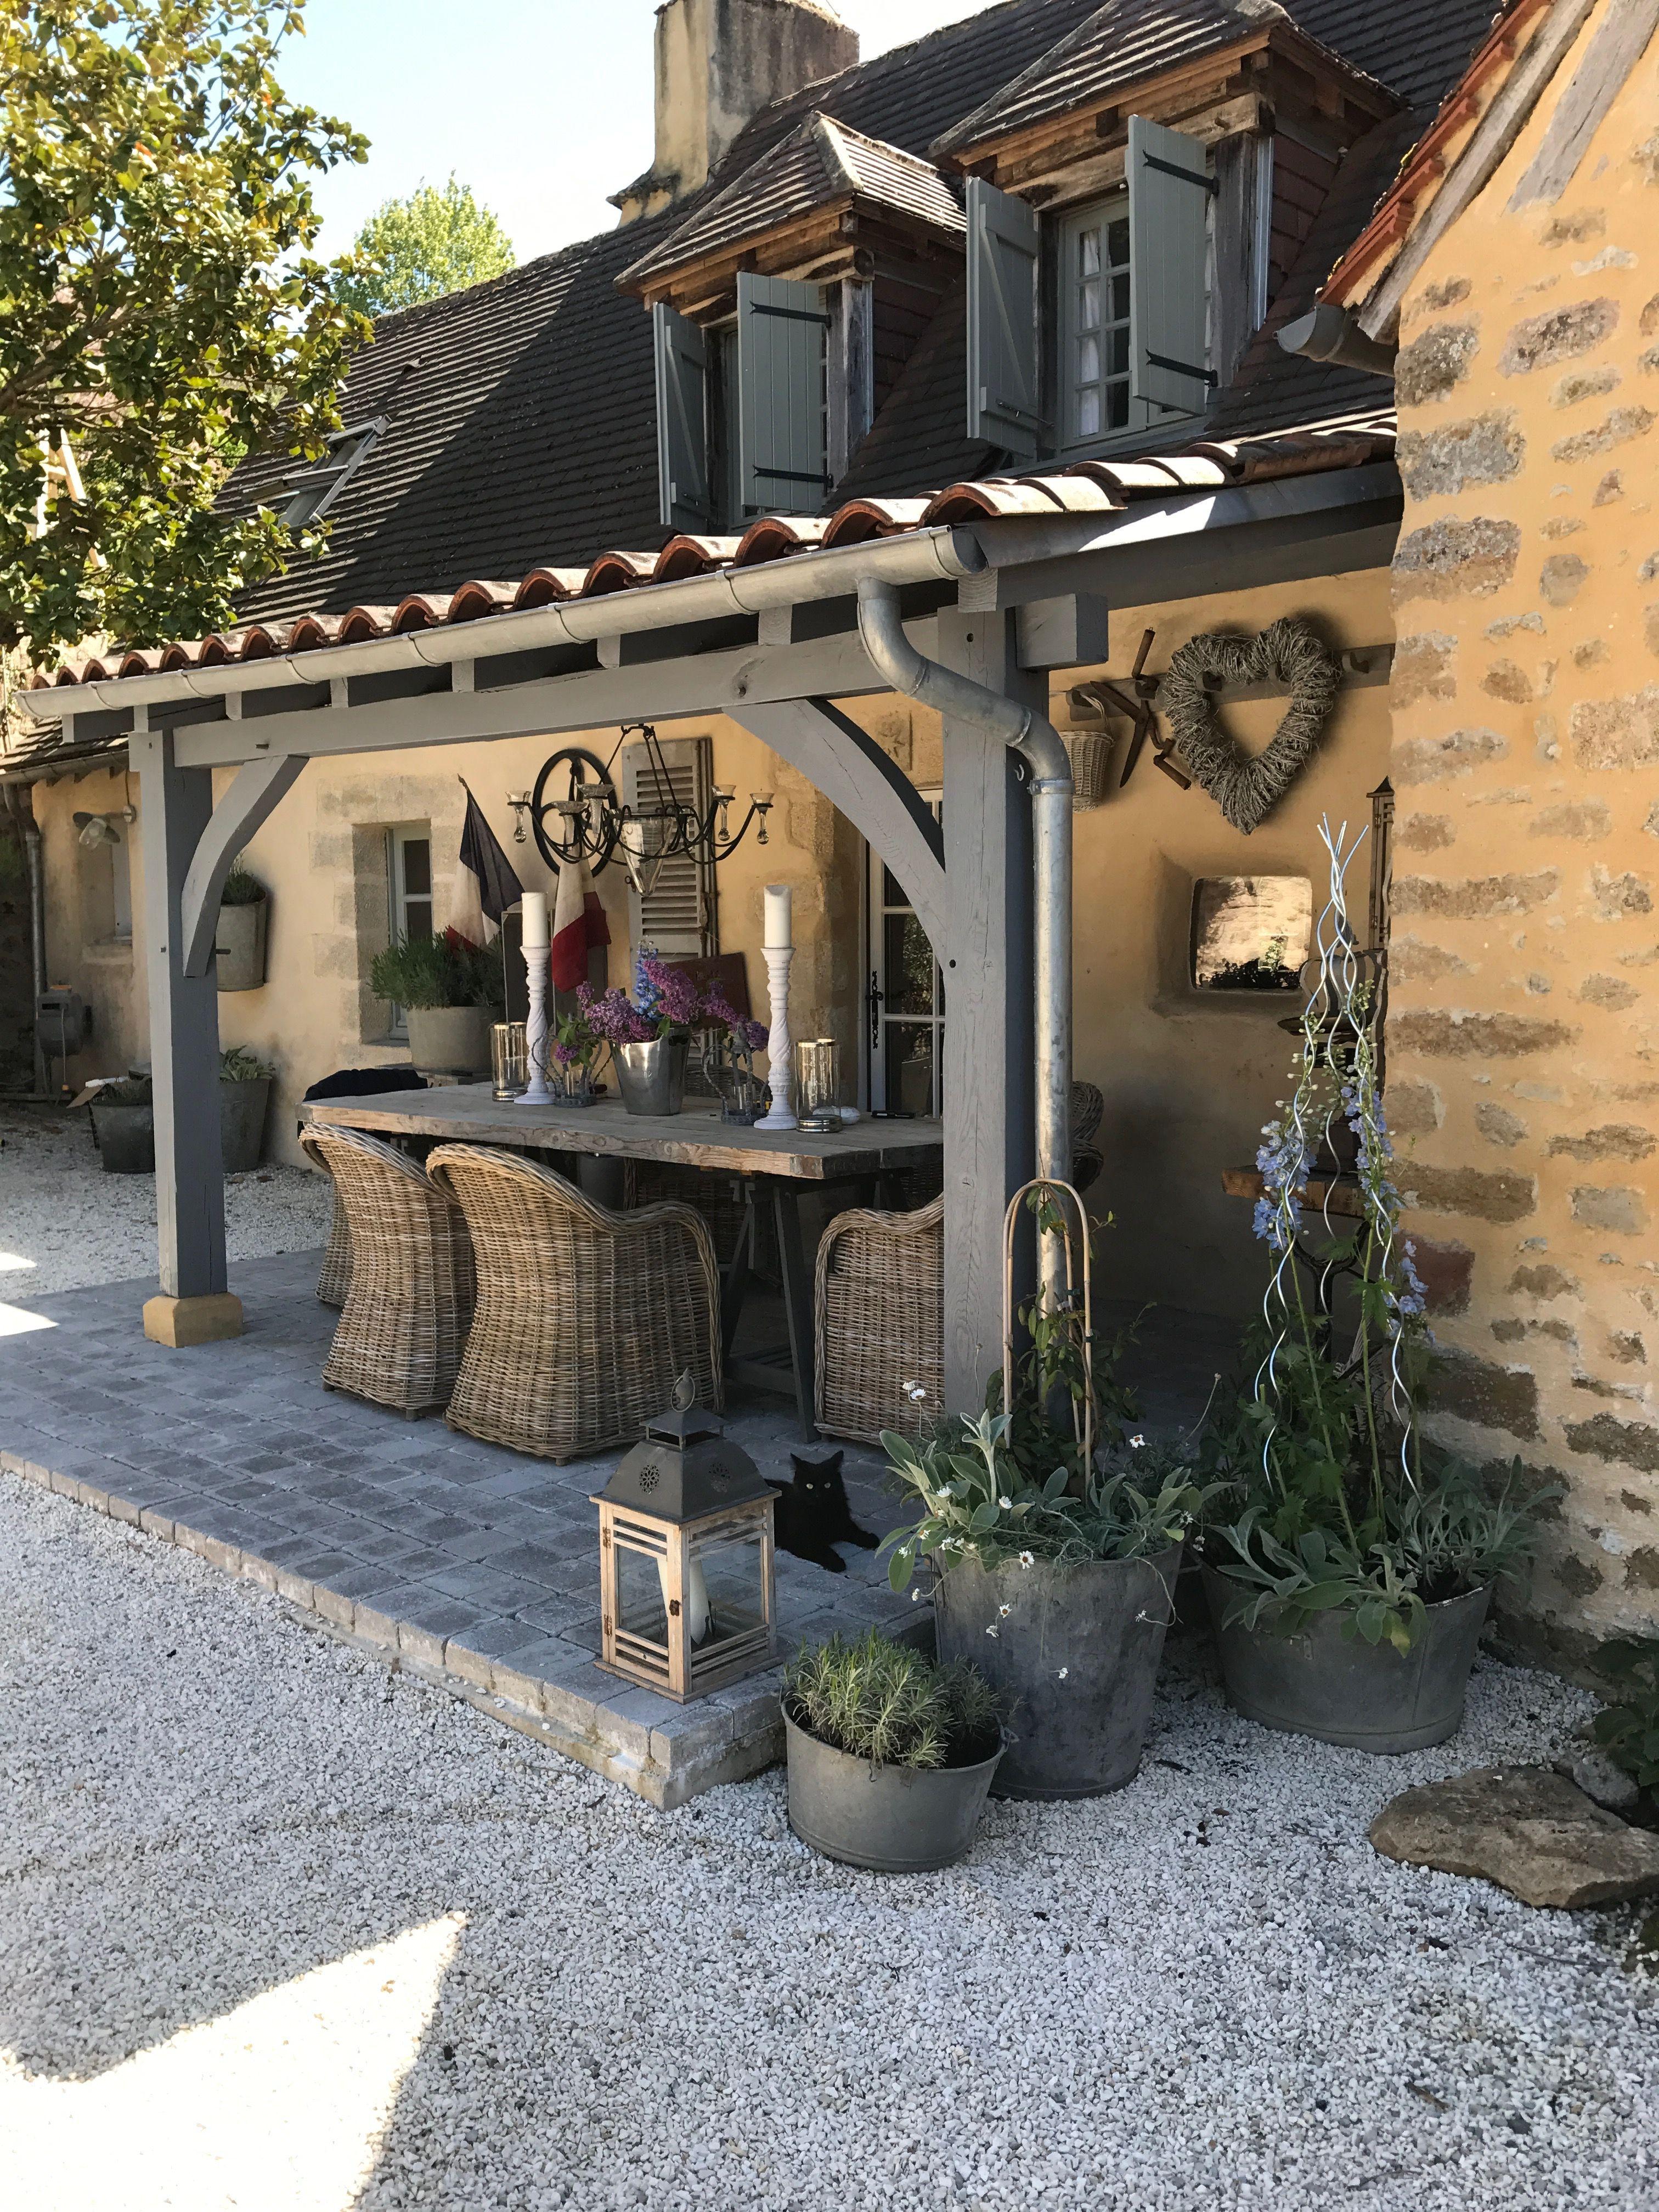 Cute outdoors patio area | Gezellige achtertuin, Huis en ... on Patio Lean To Ideas id=81555